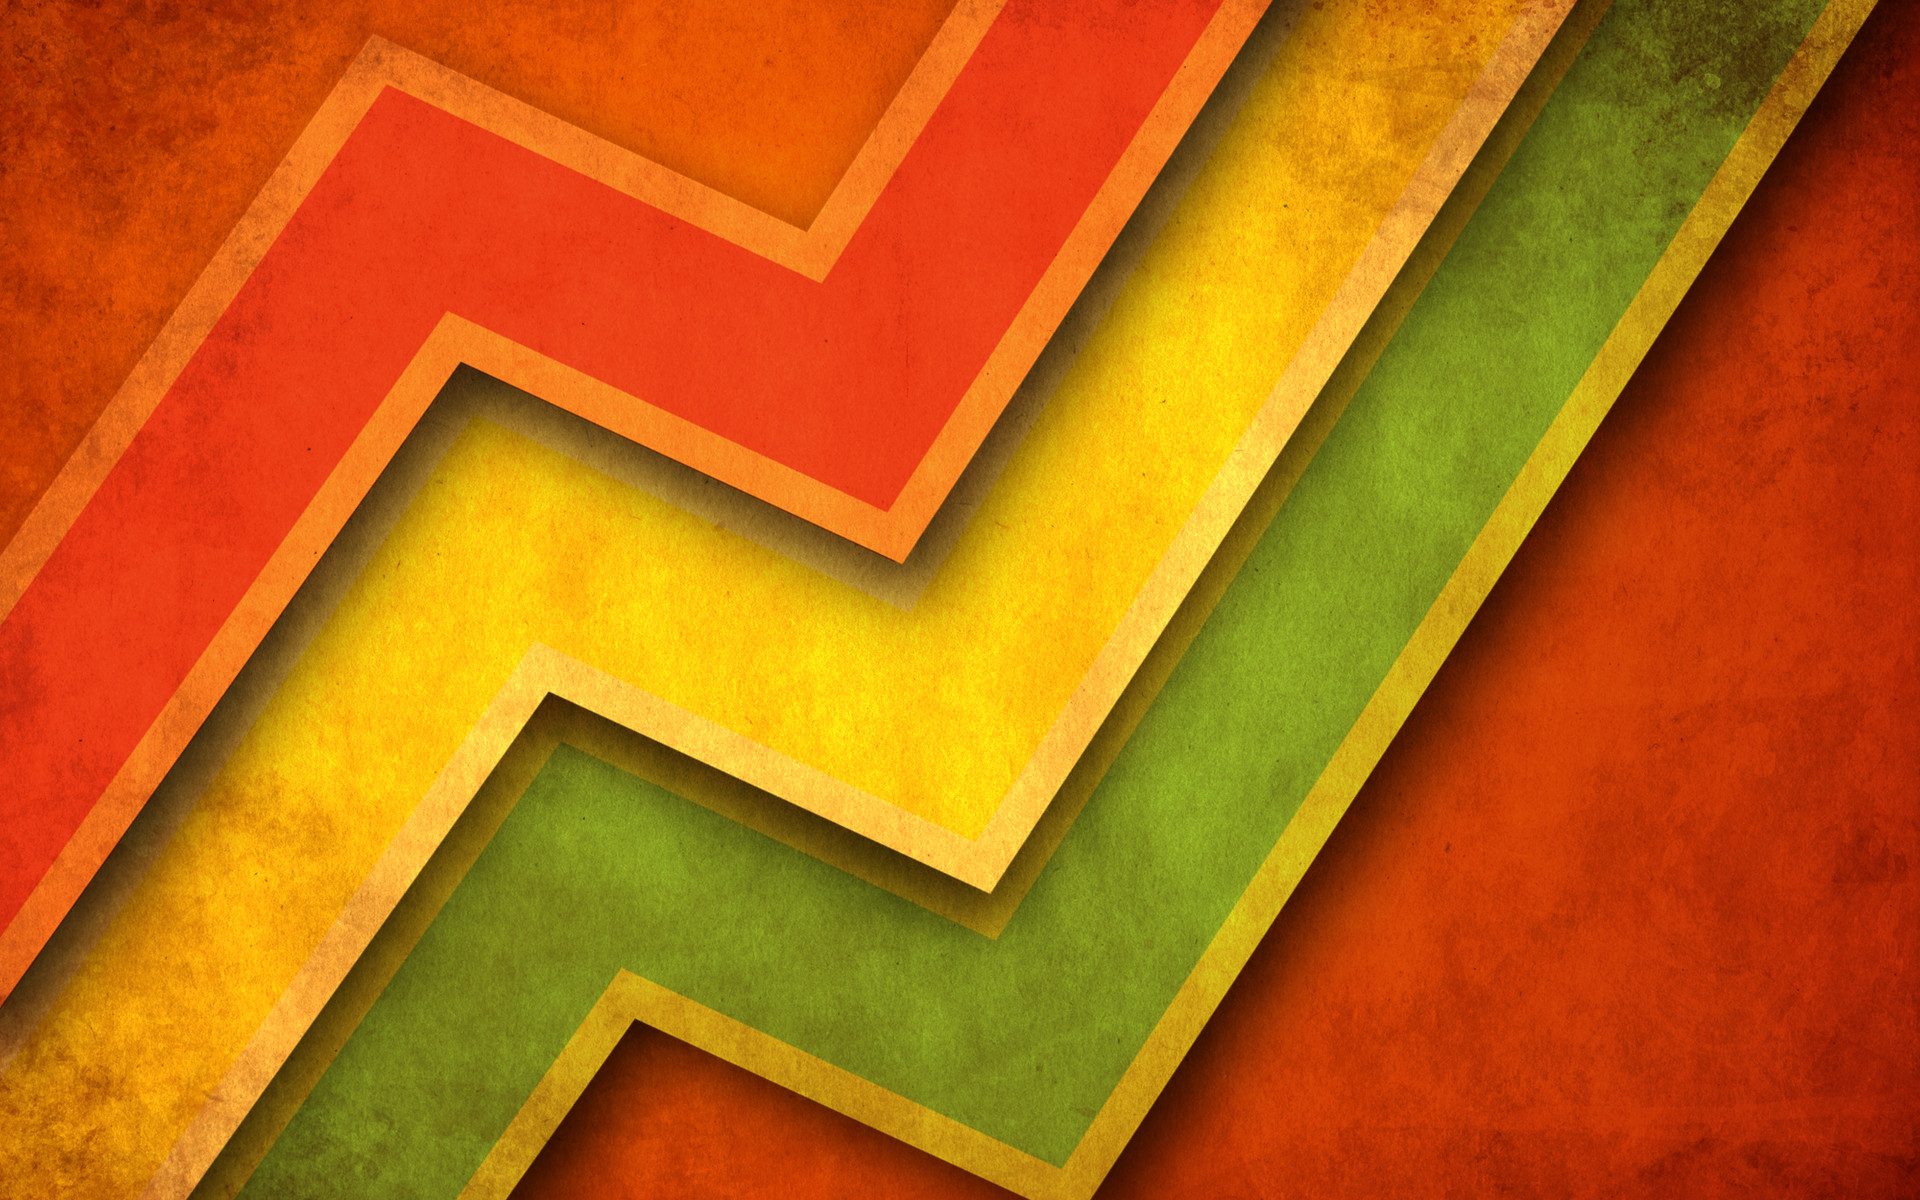 Abstract Design Green Grunge Multicolor Orange Yellow